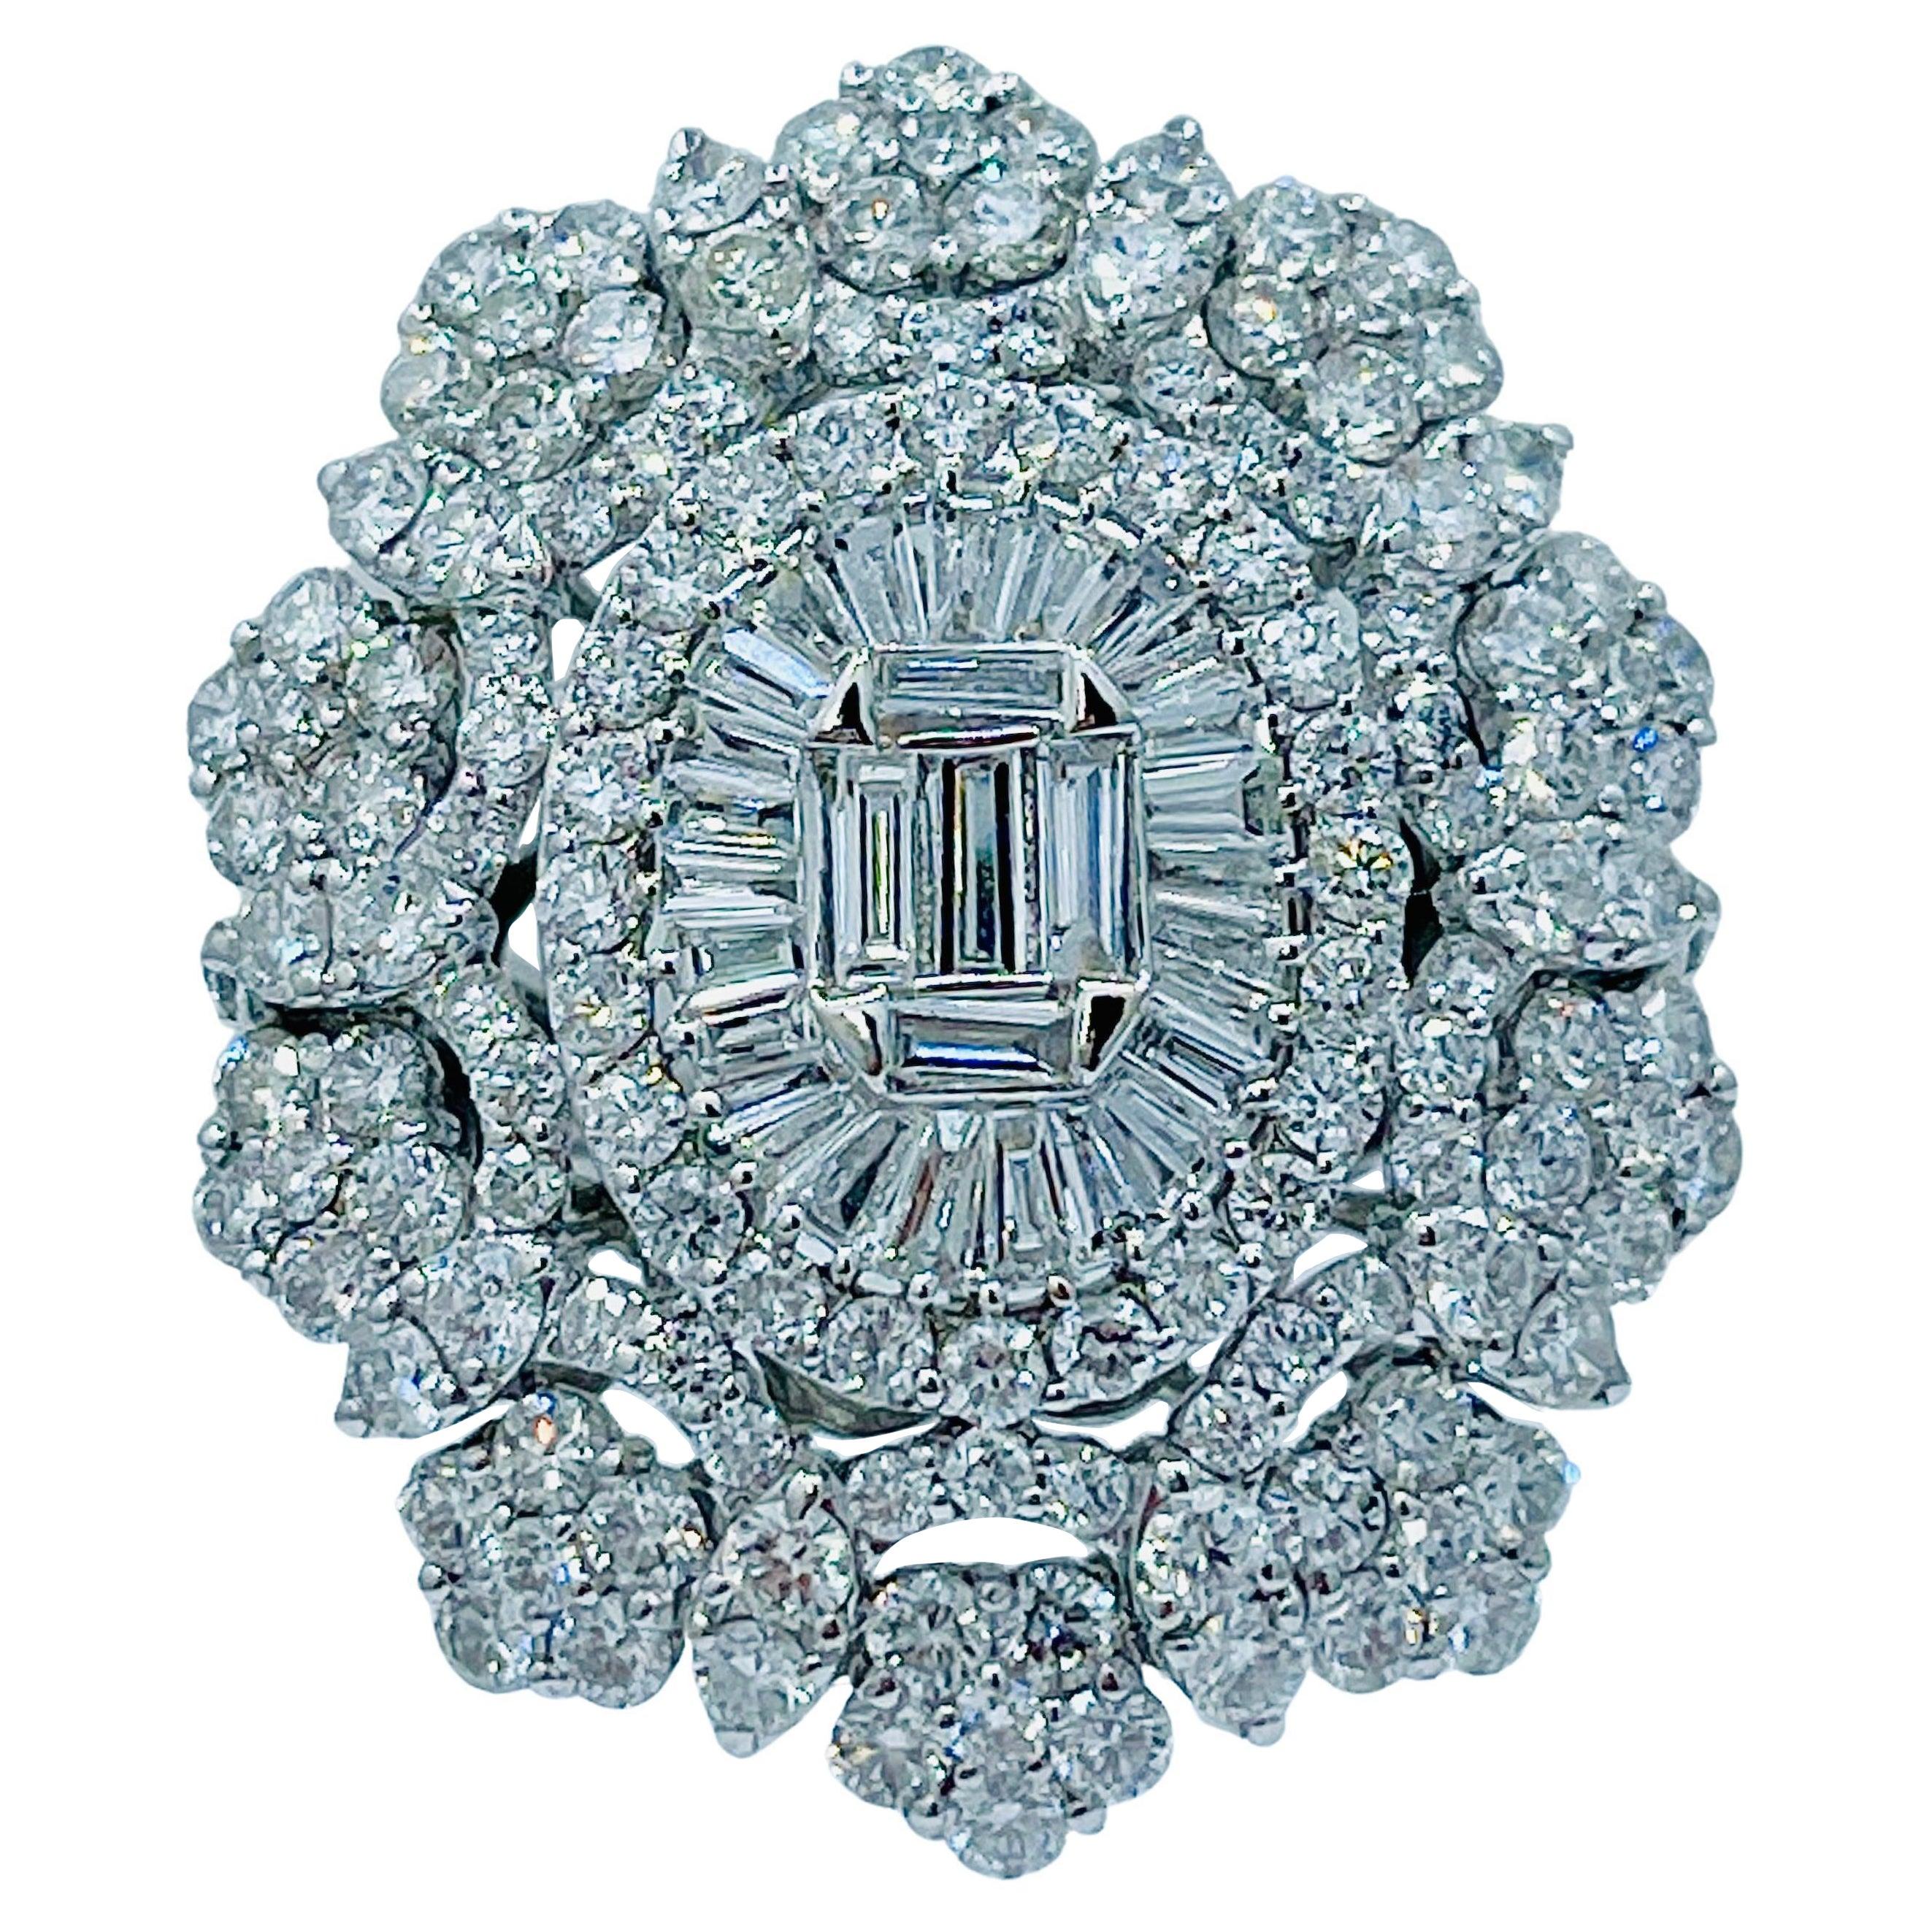 Spectacular 9 Carat Diamond Large Medallion Shaped 18K White Gold Cocktail Ring